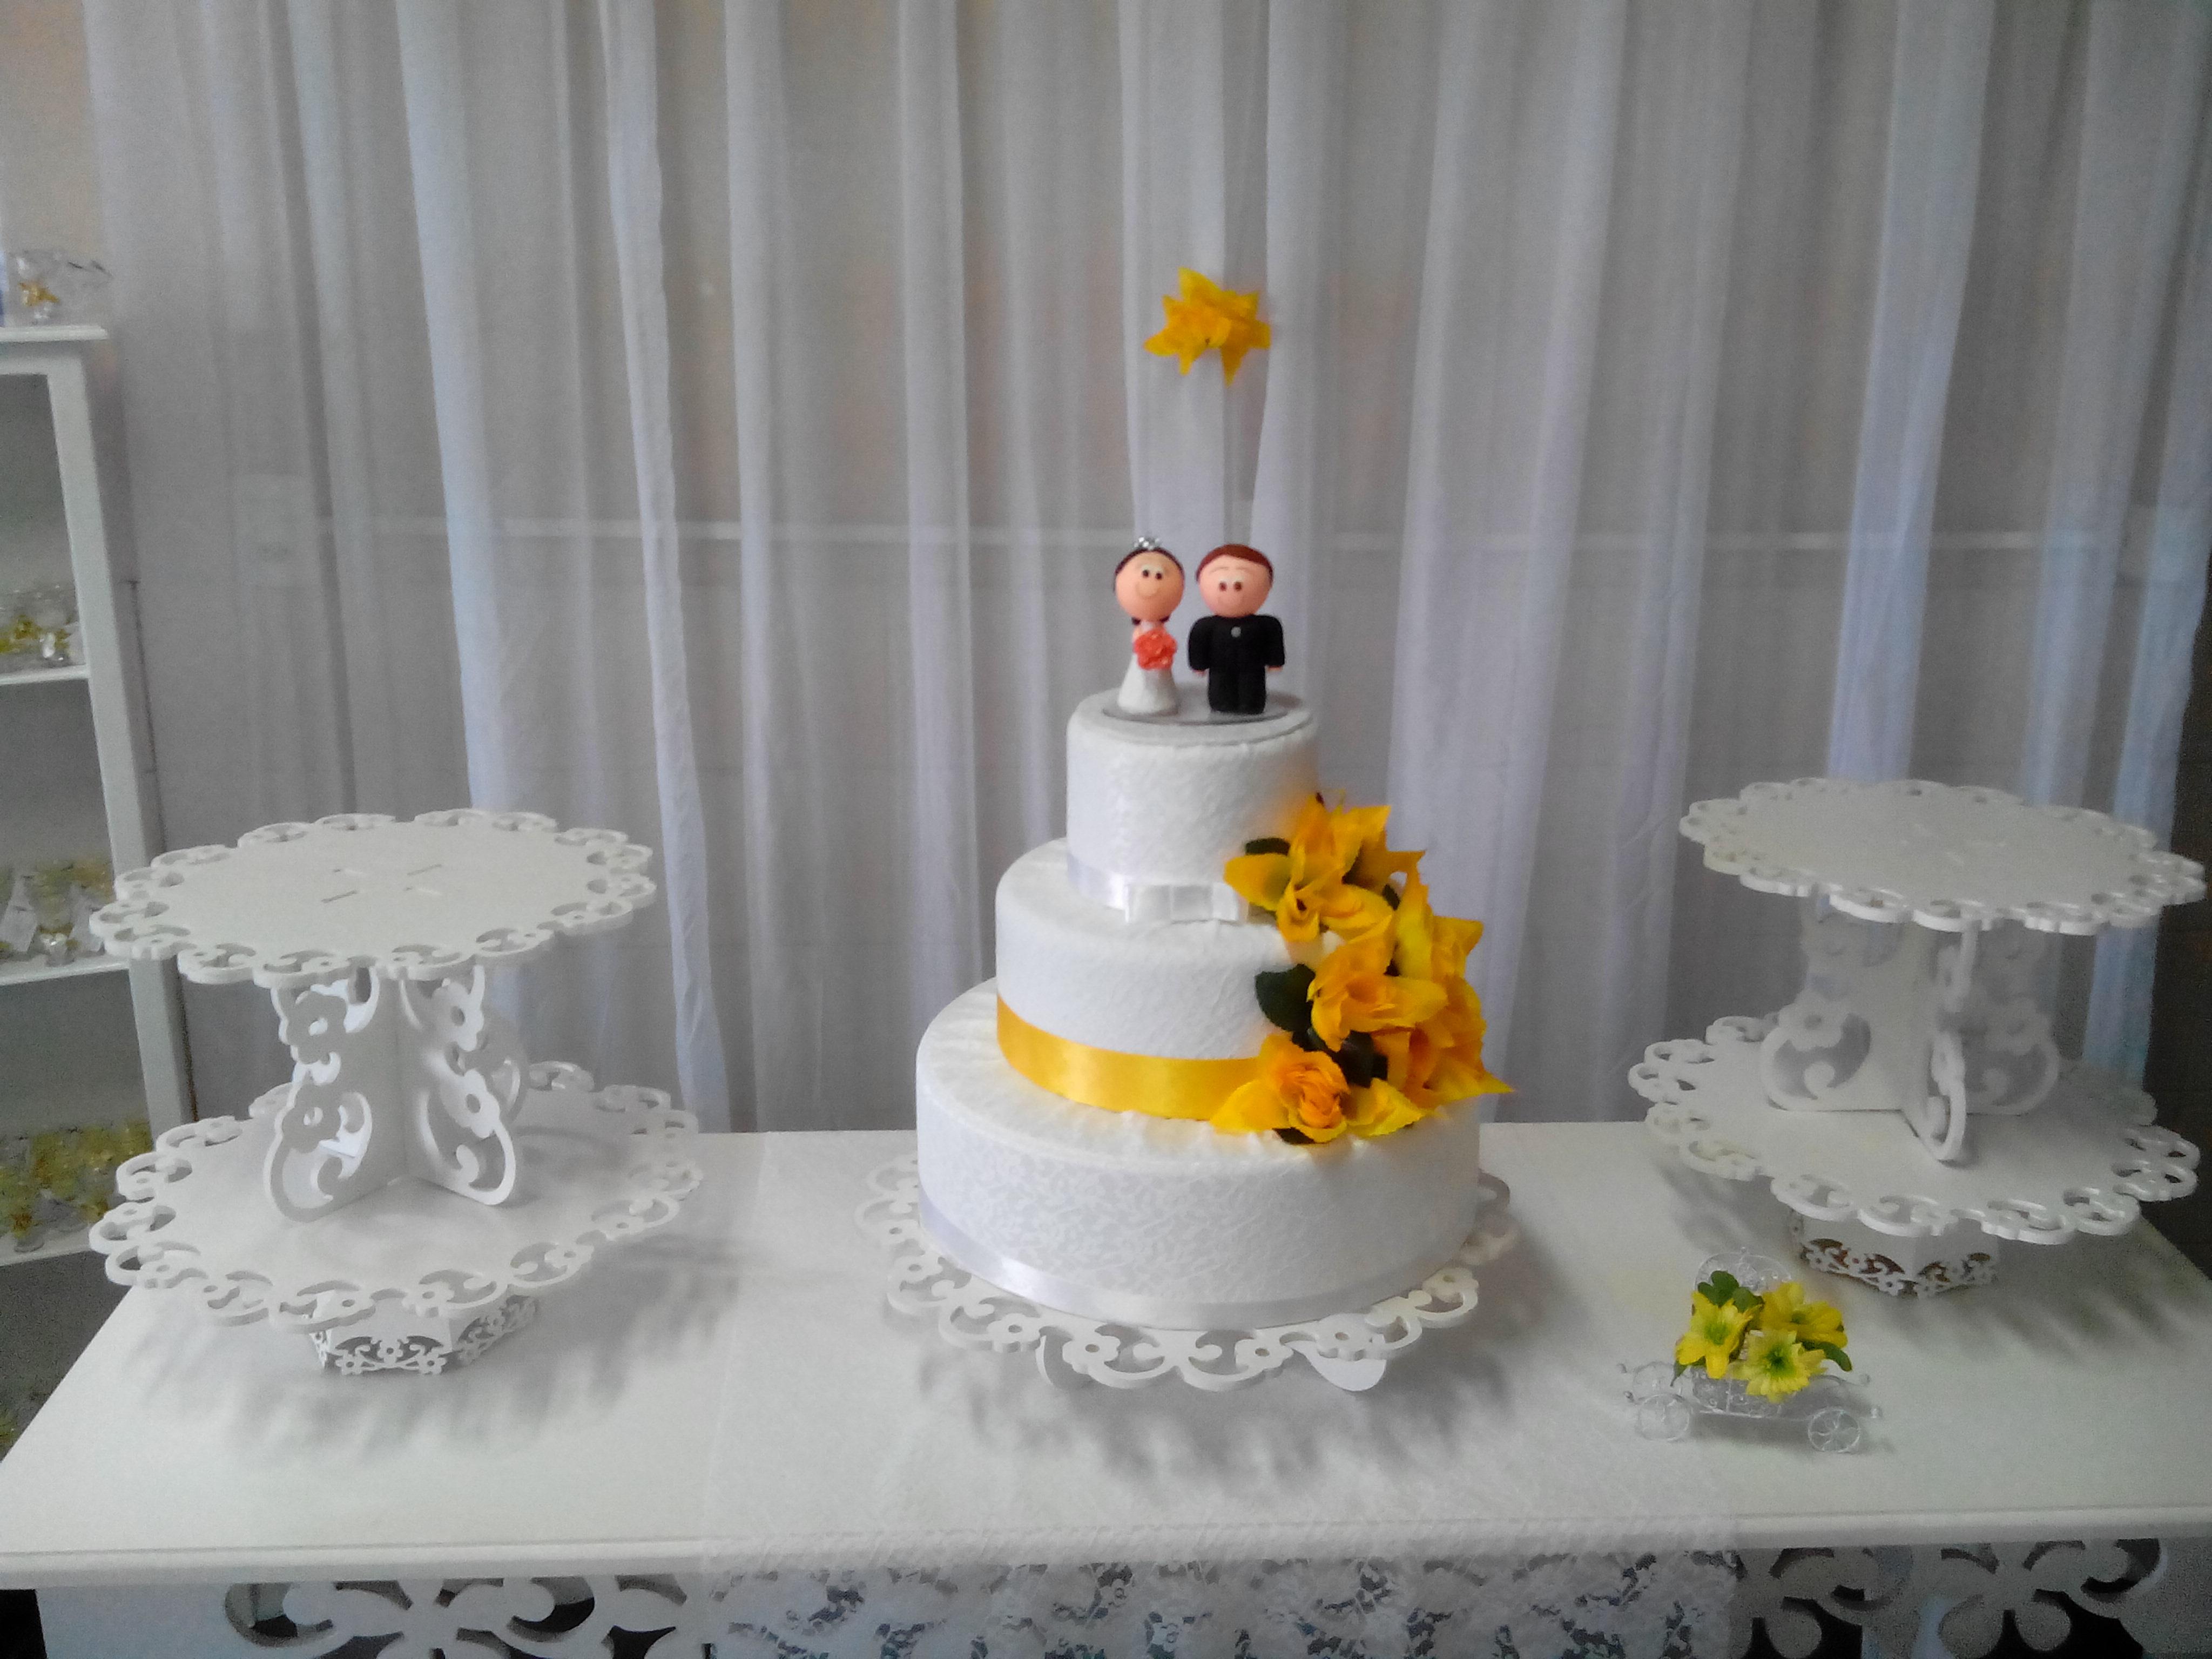 decoracao branco e amarelo: amarelo e branco festa casamento casamento provencal amarelo e branco